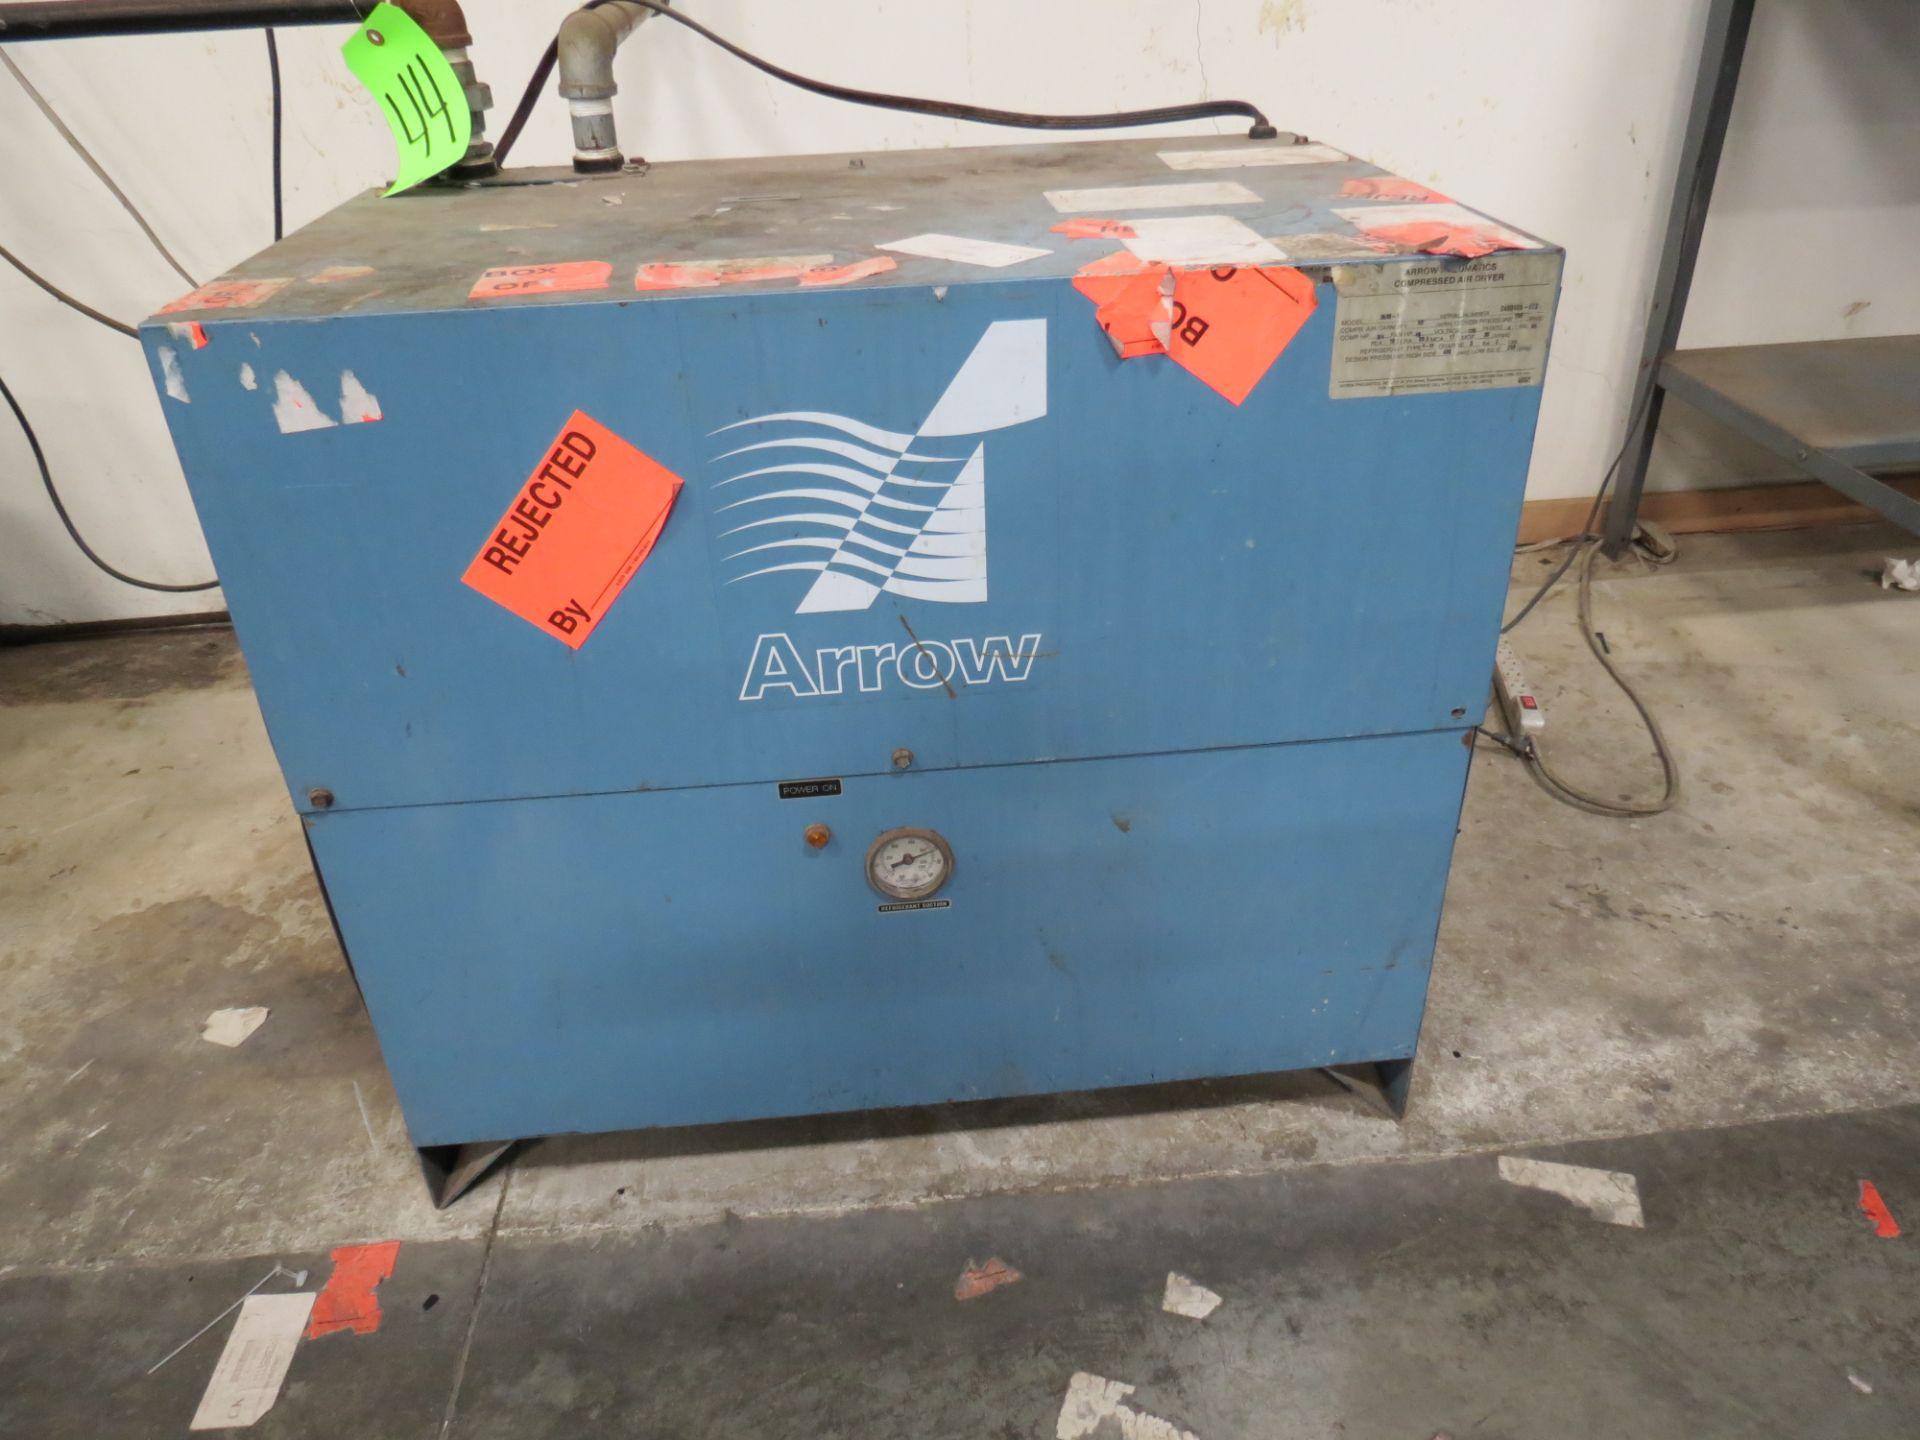 Arrow Pneumatics, Inc. 3530-1 Dryer Backup, 110V, SN:2452453-072